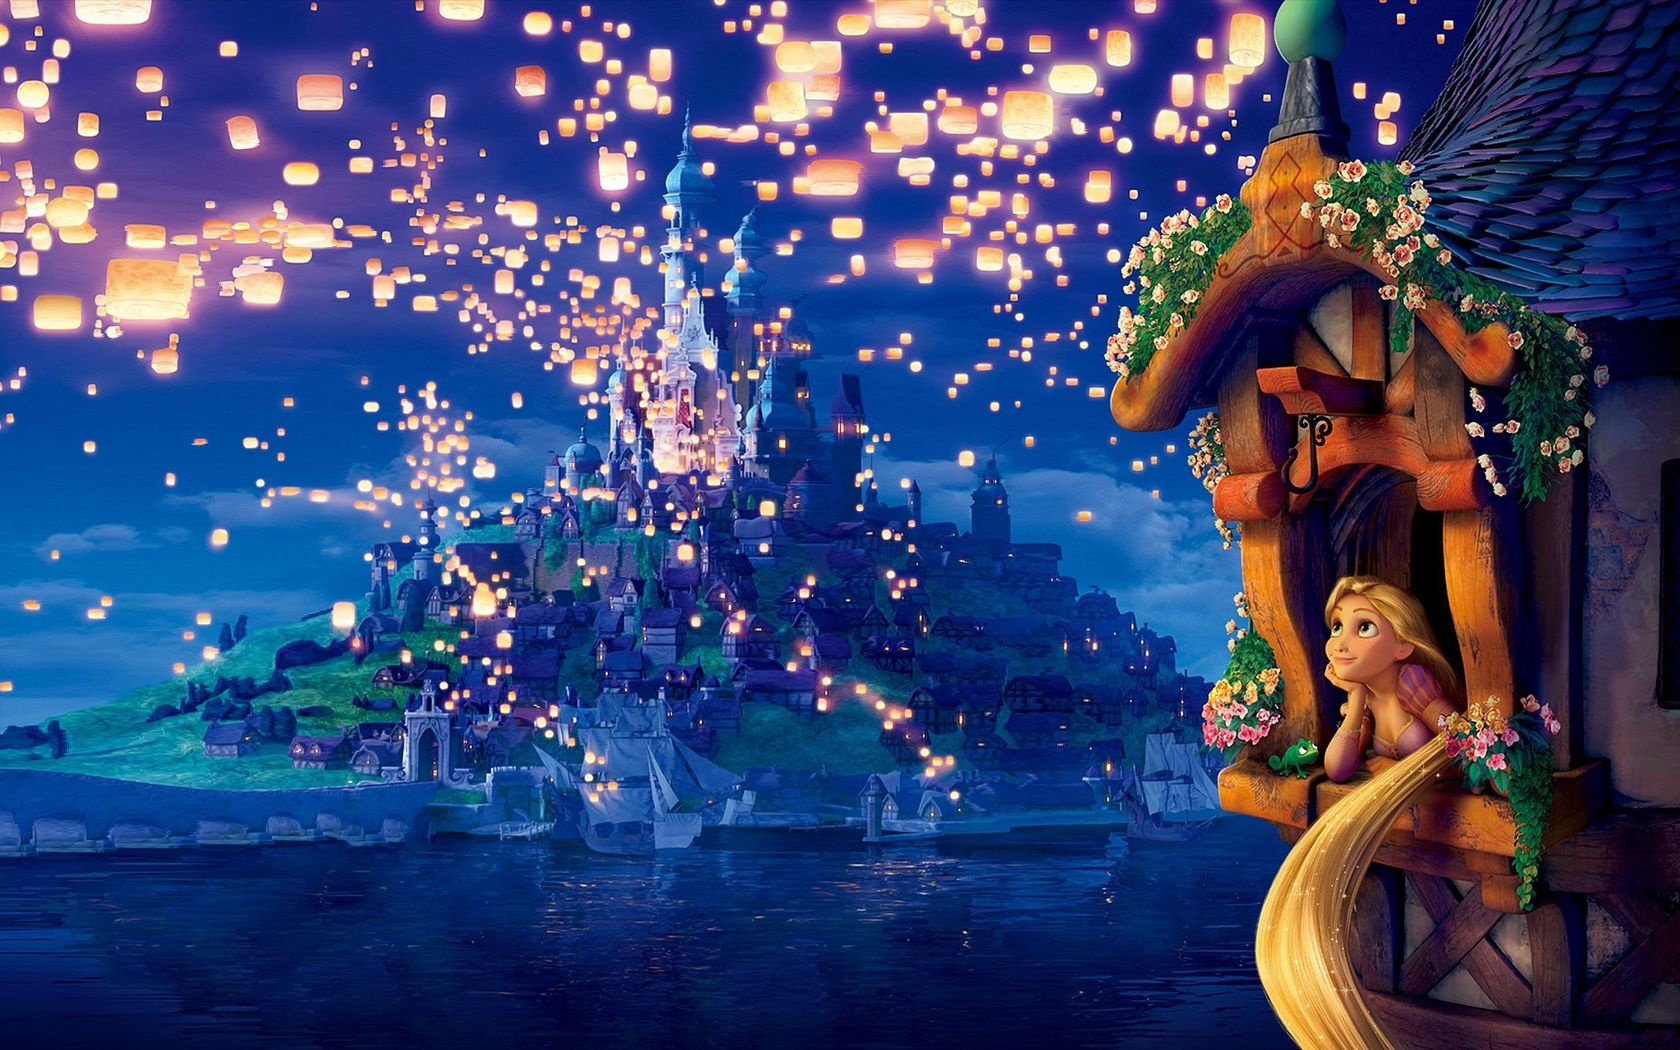 Rapunzel   Tangled wallpaper 18621 1680x1050